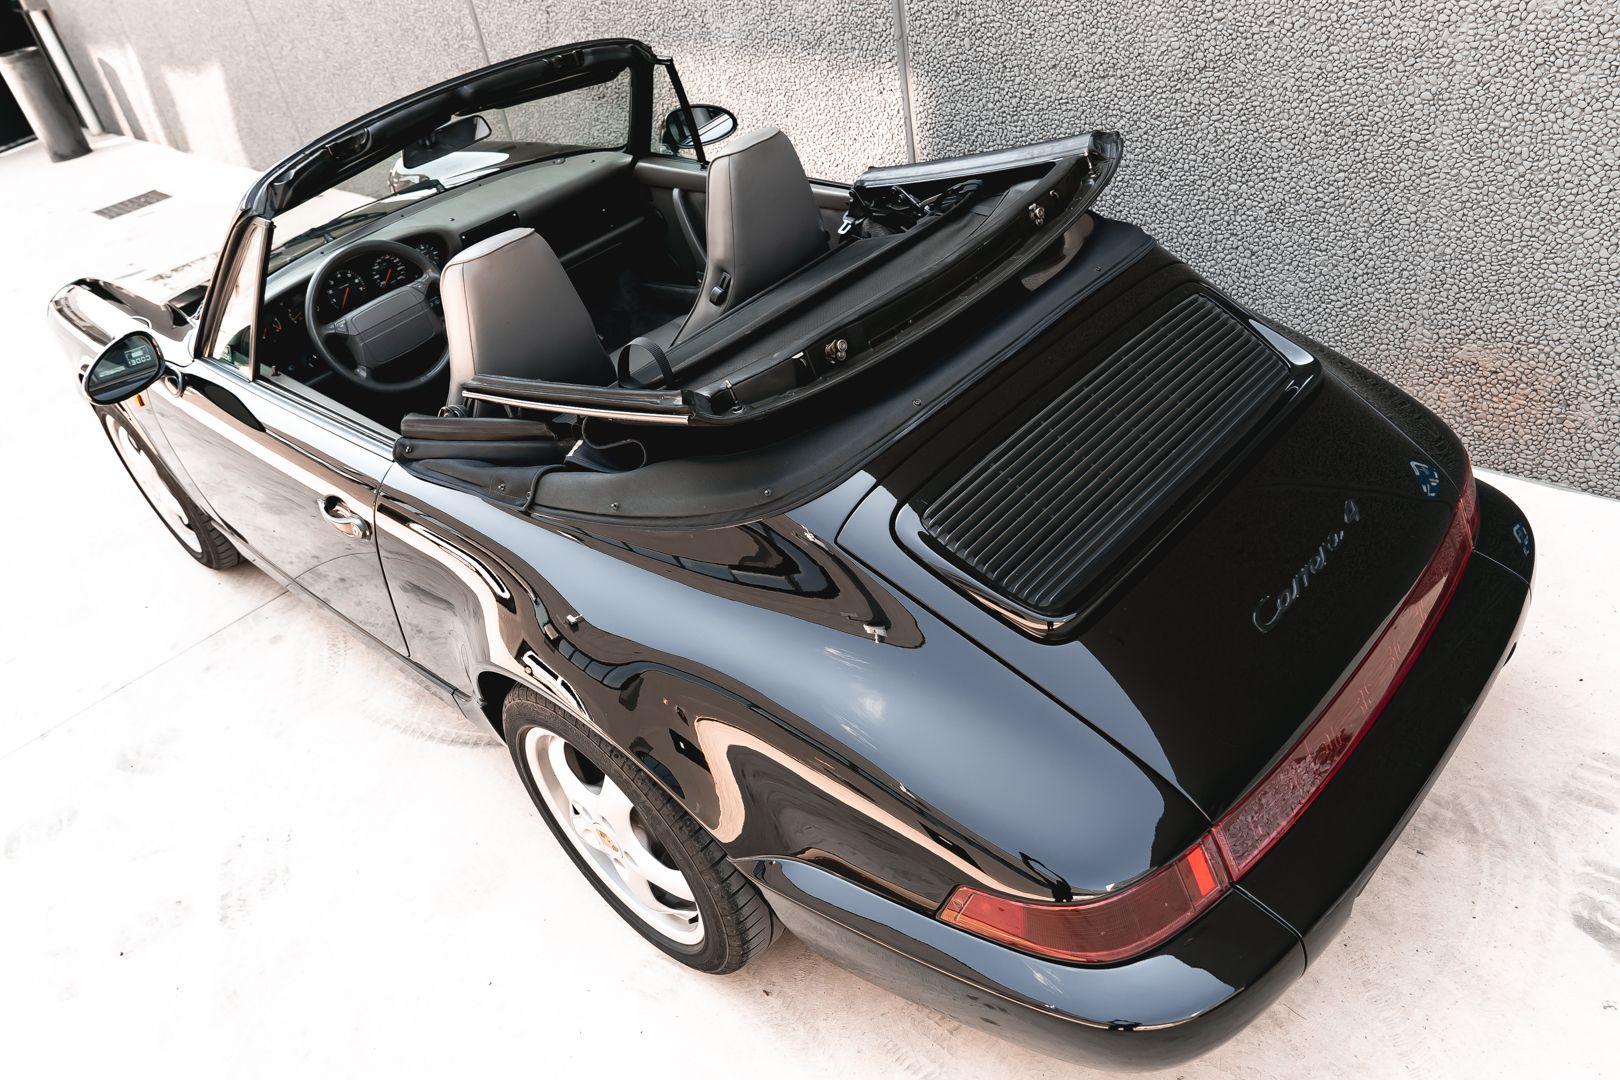 1991 Porsche 911/964 Carrera 4 79226